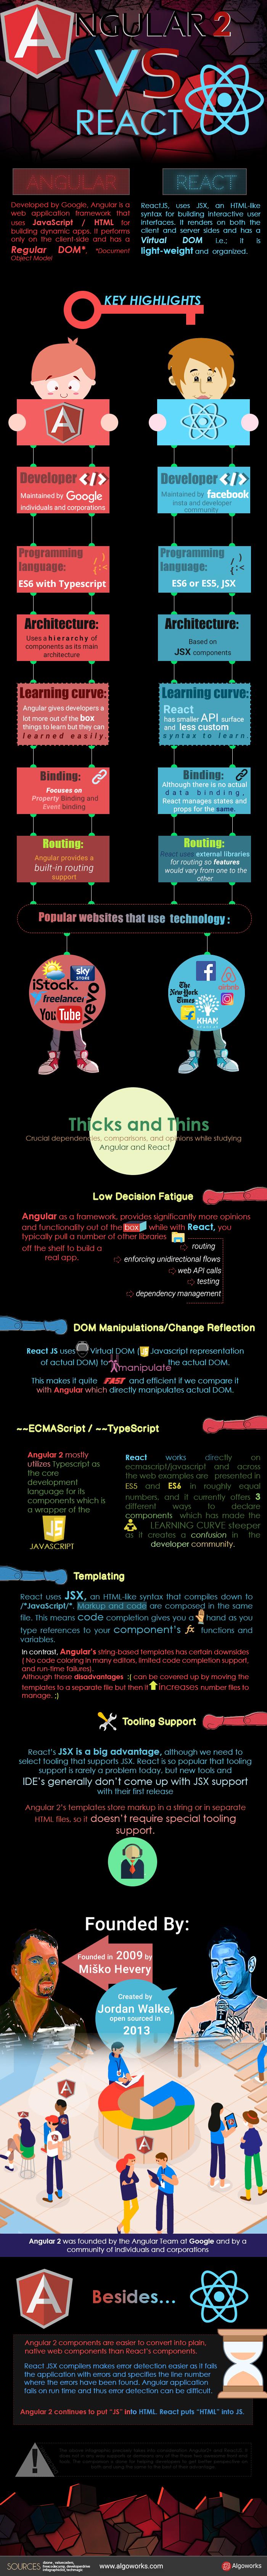 Angular2 vs React – War of Facts   An Infographic